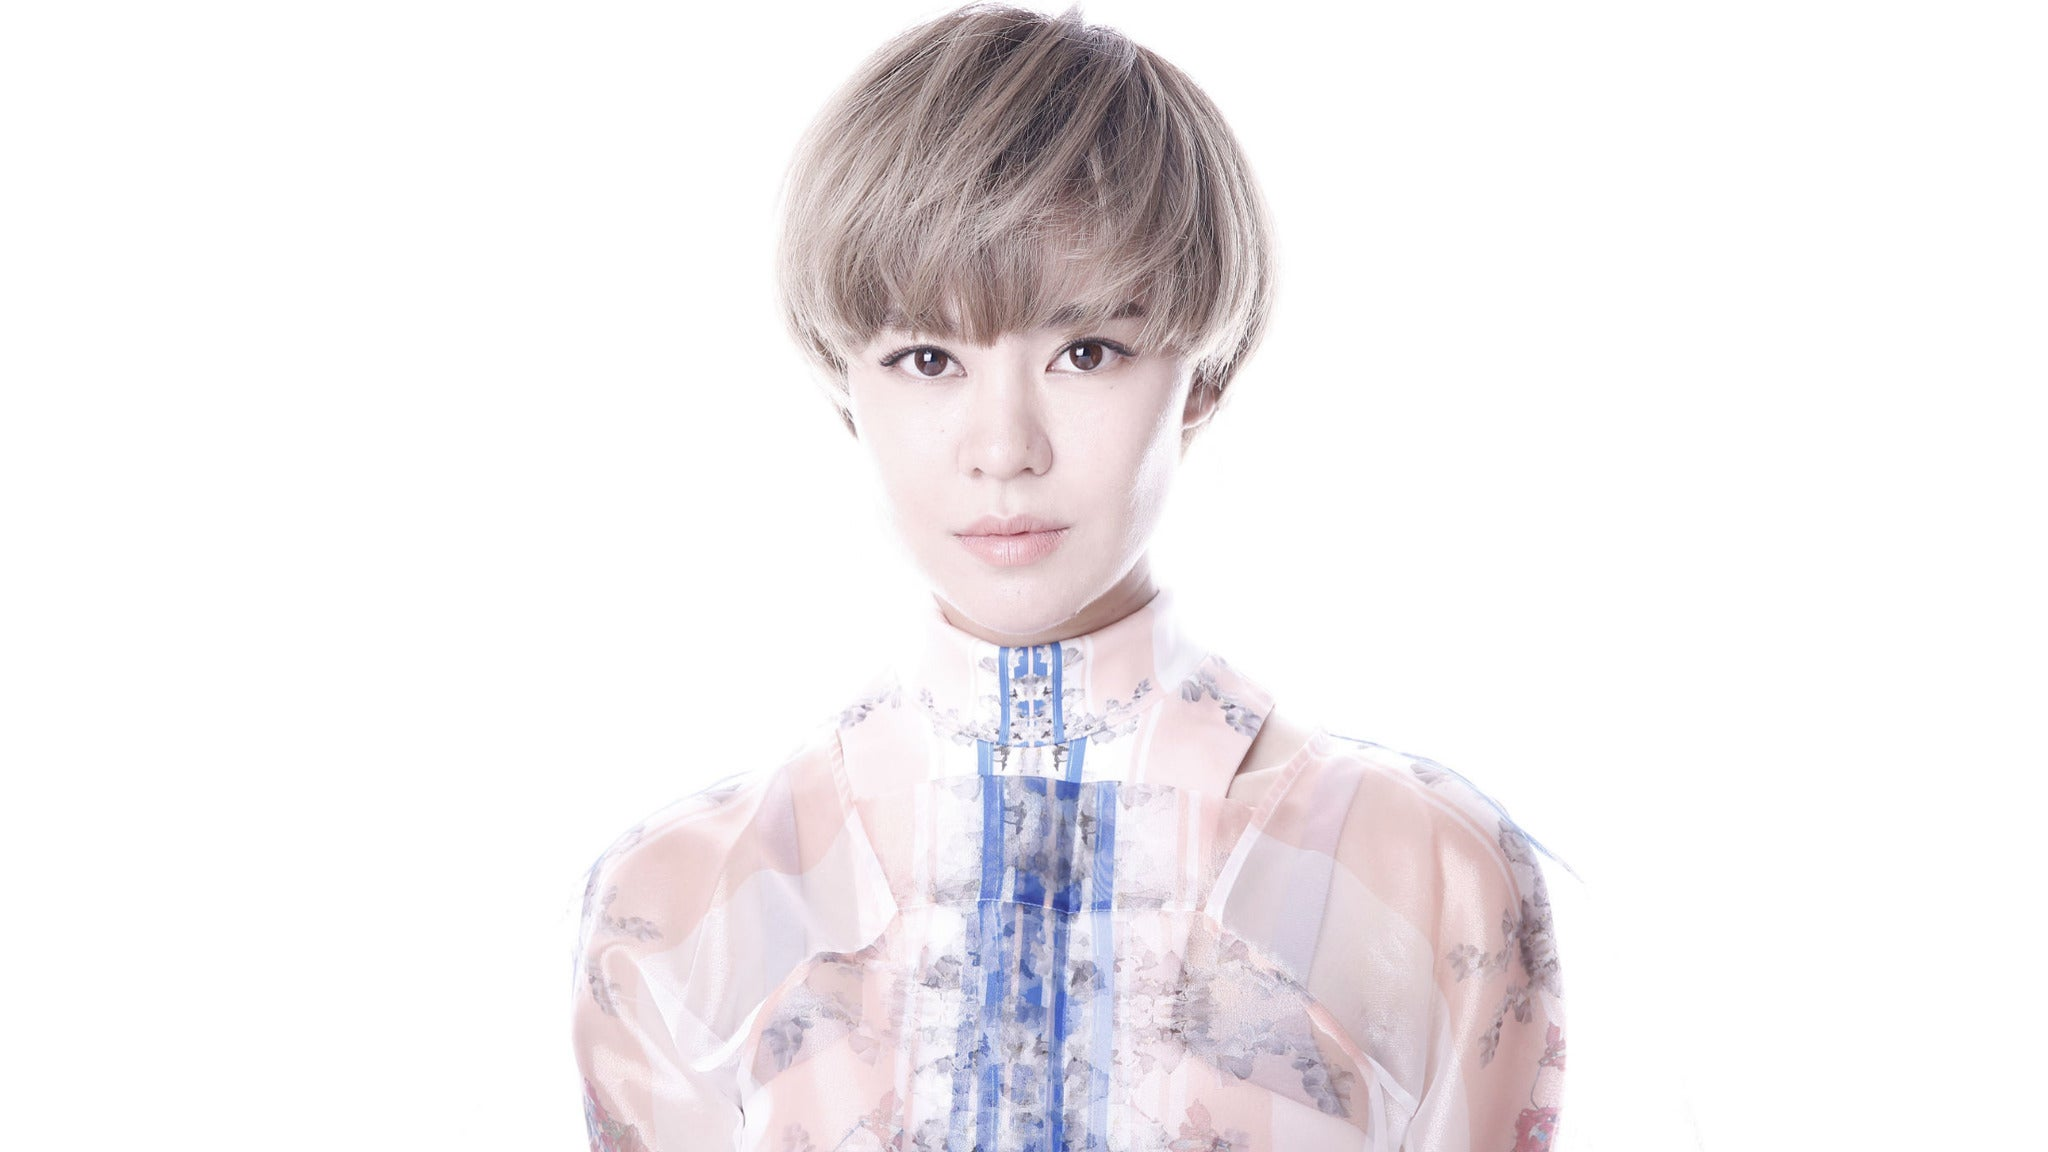 Kewei (yisa) Yu Presented By Hiway Media